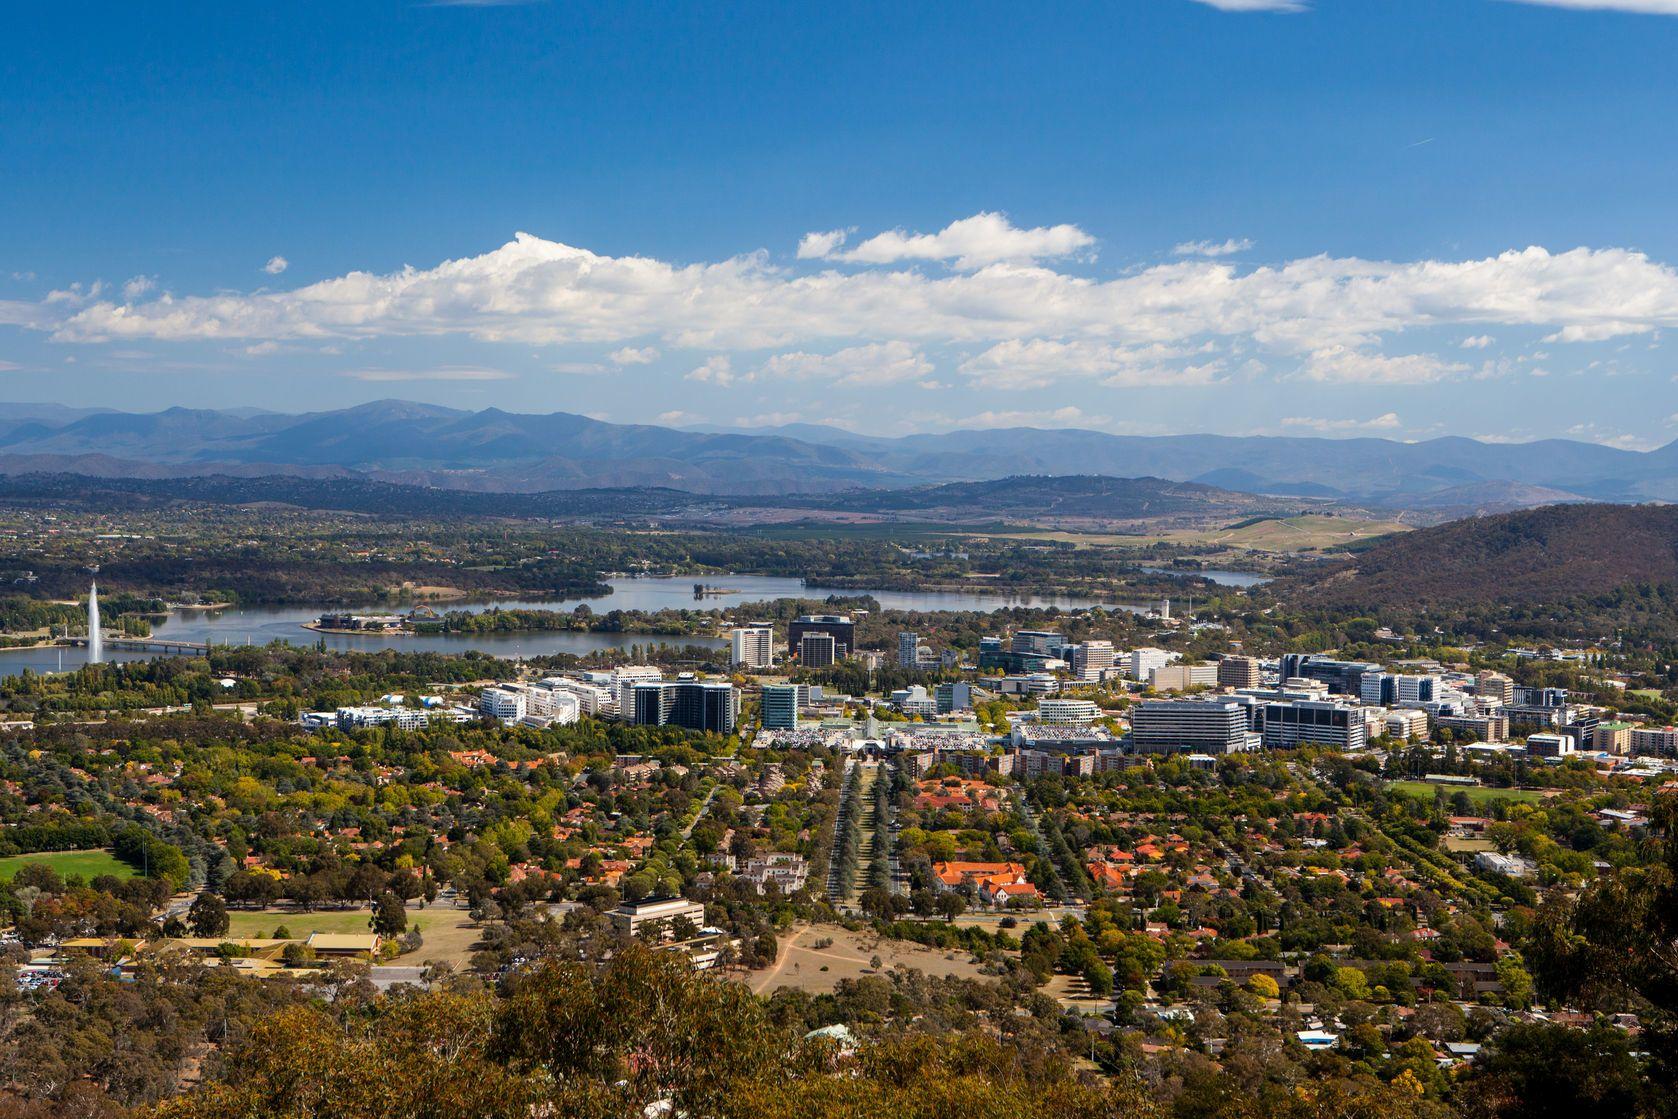 Pohled na Canberru v Austrálii | filedimage/123RF.com